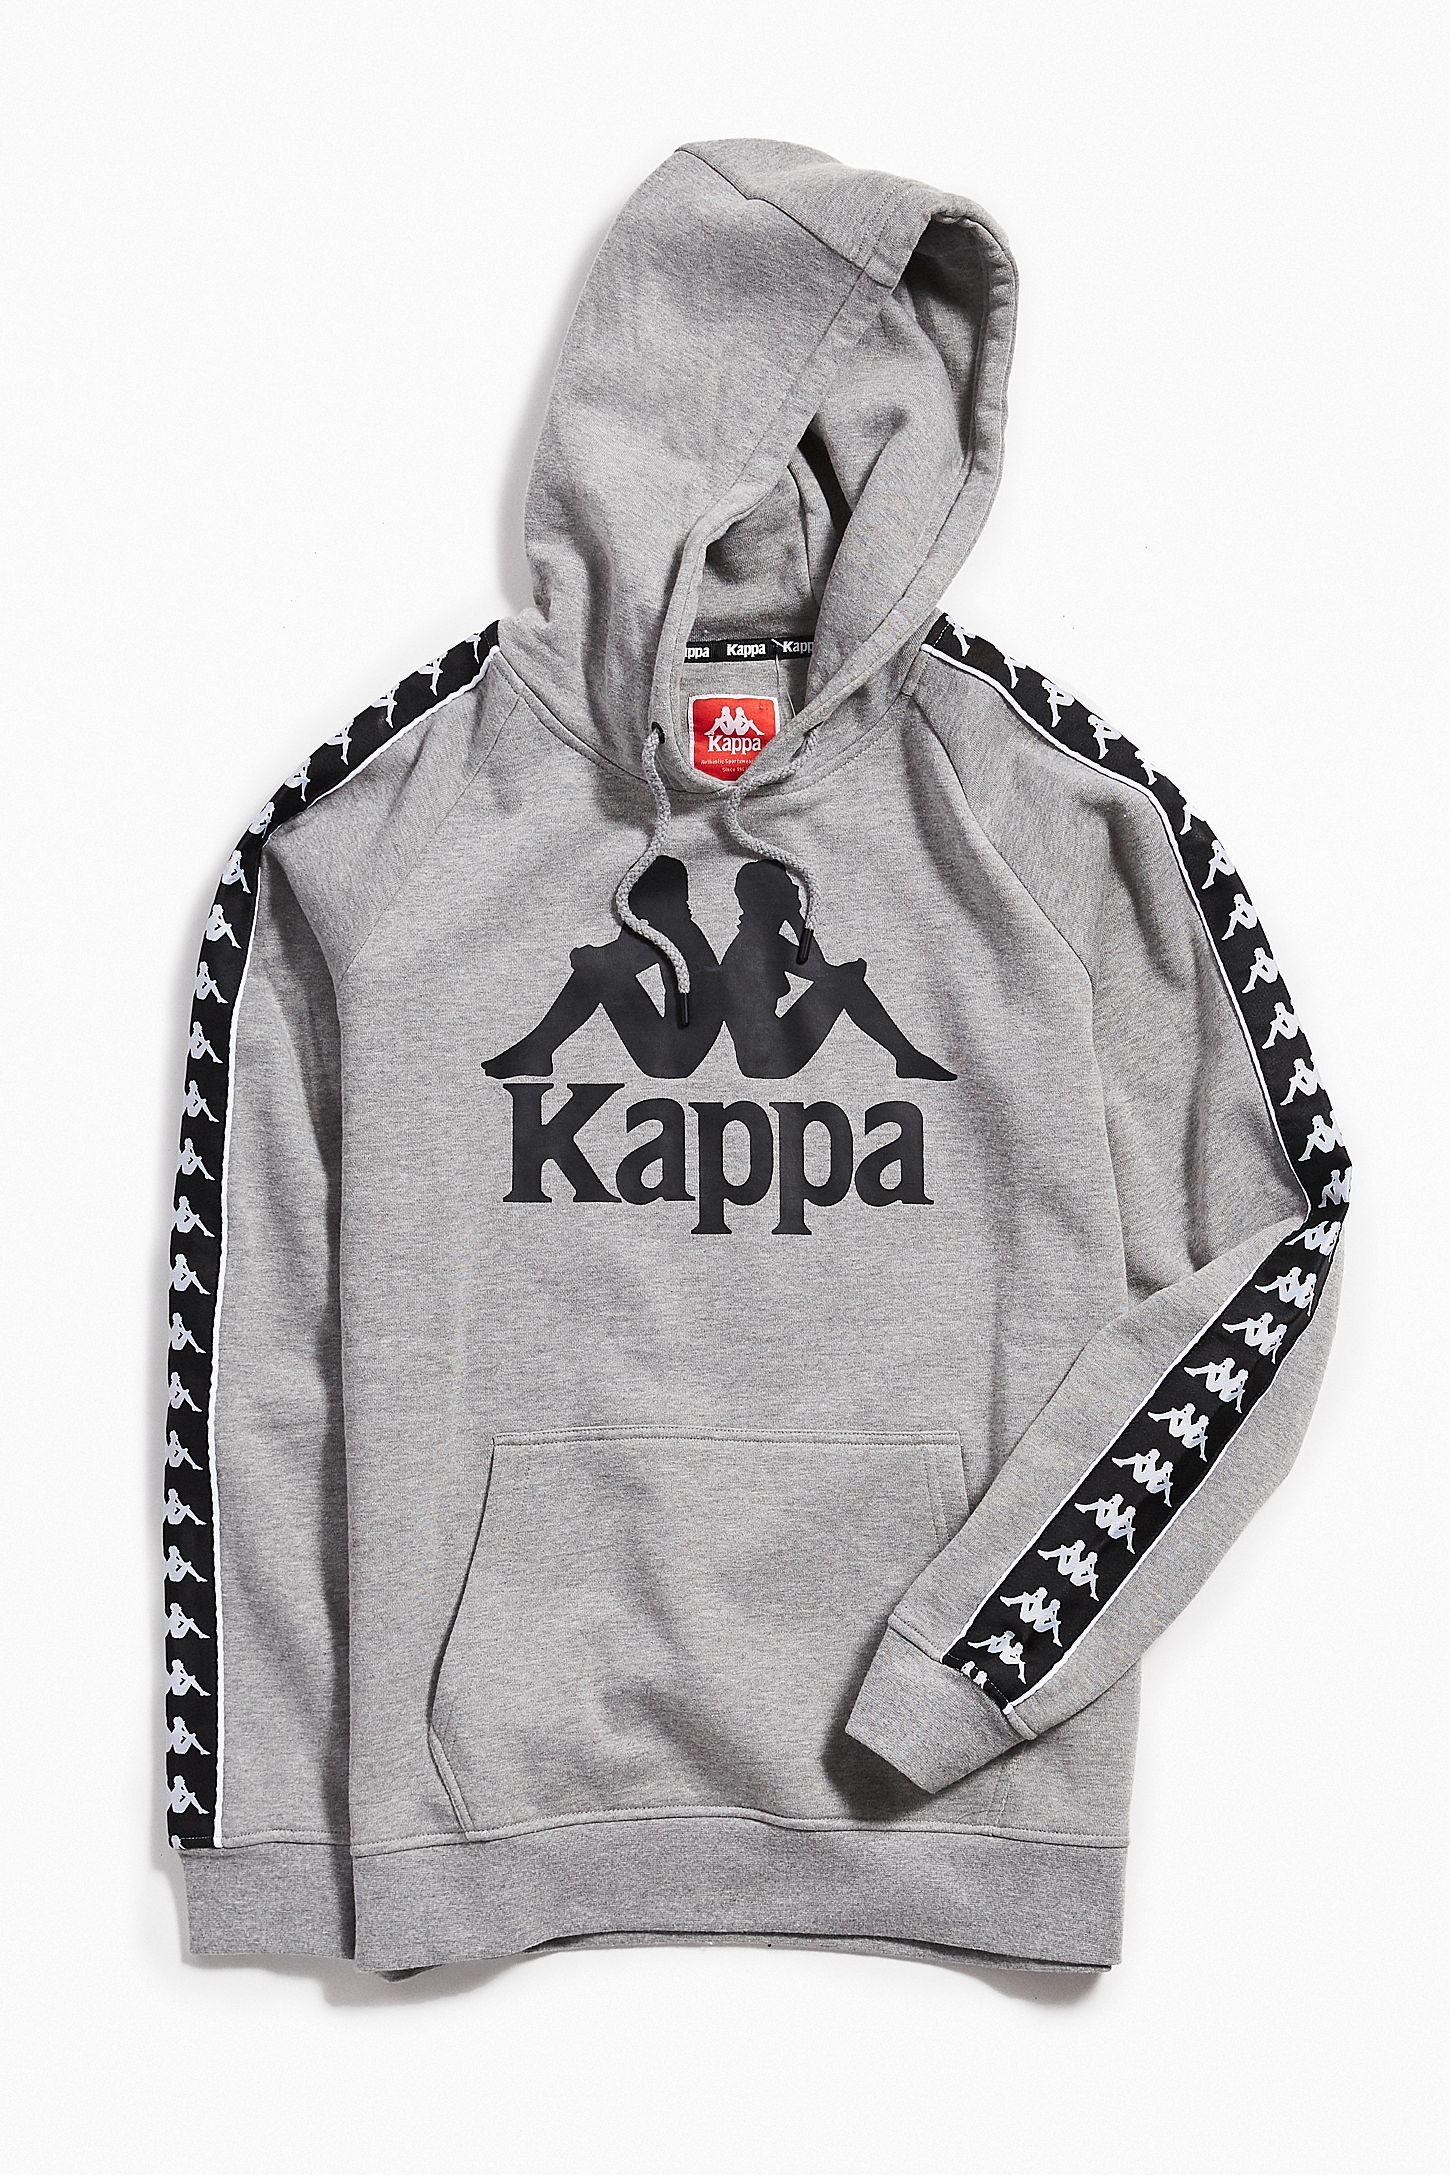 3bfbea1fafab Kappa Authentic Hurtado Hoodie Sweatshirt